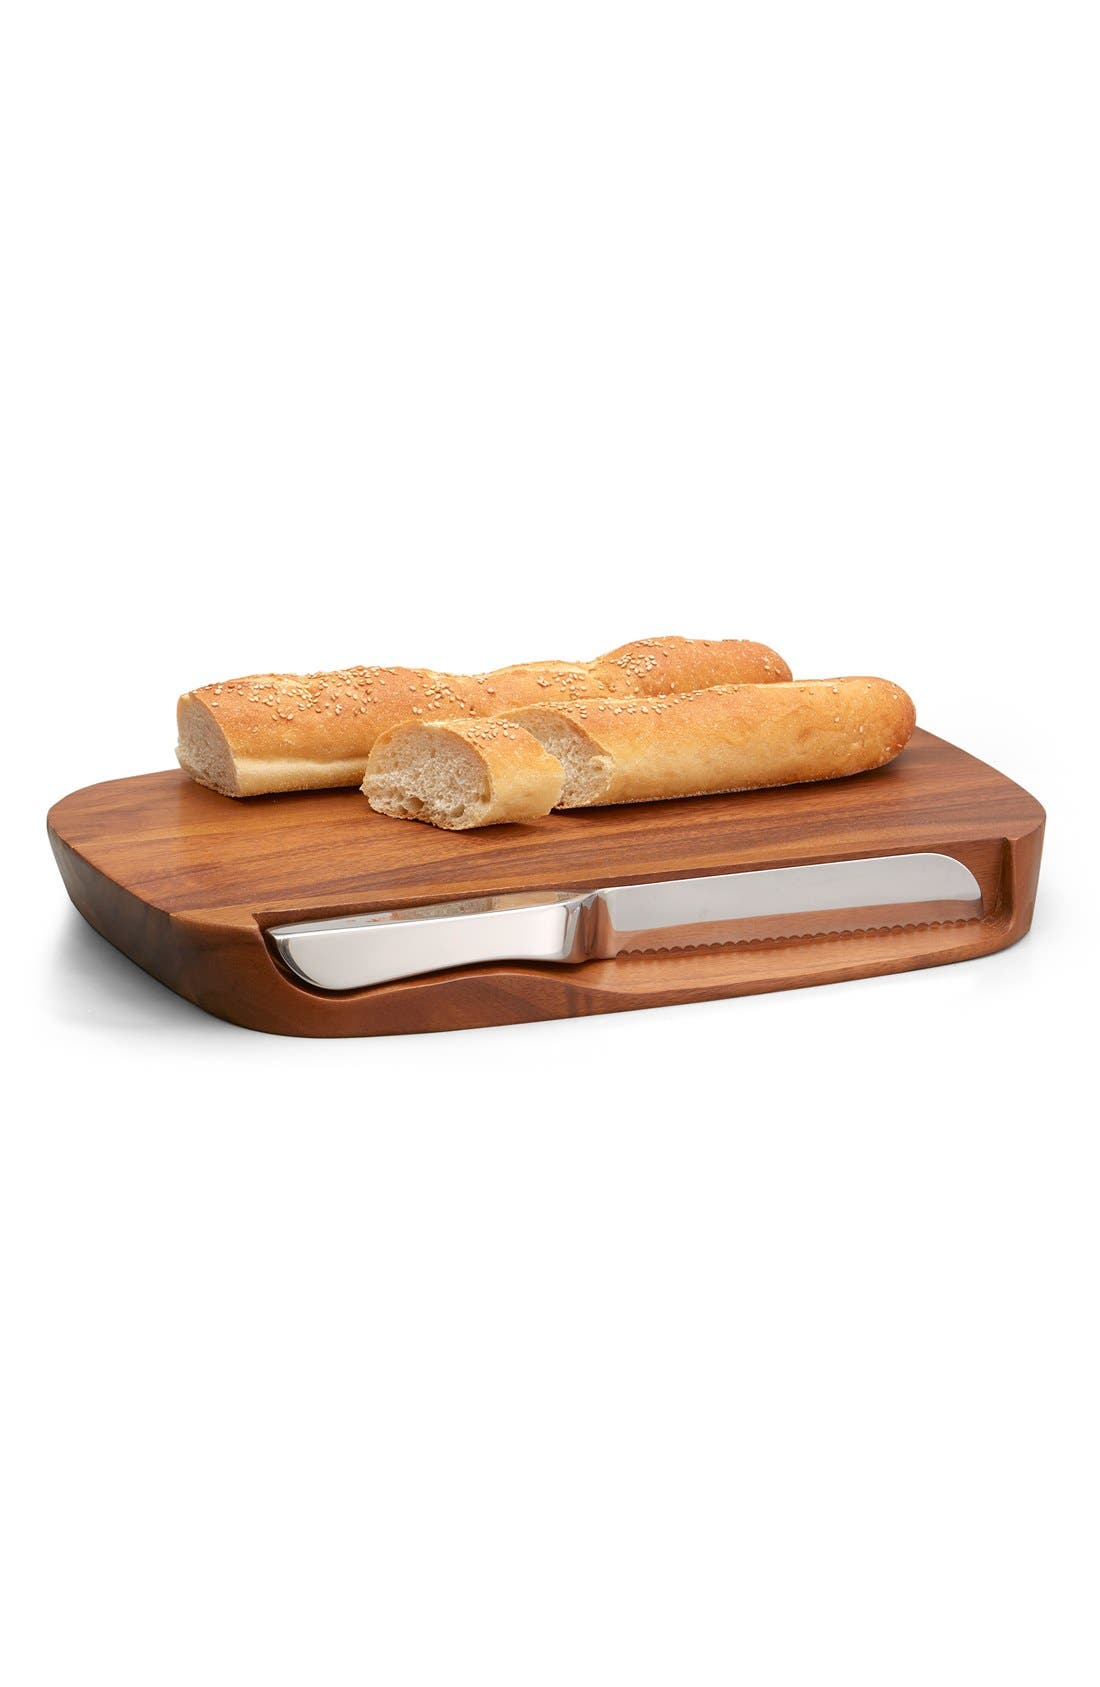 Main Image - Nambé 'Blend' Bread Board & Knife